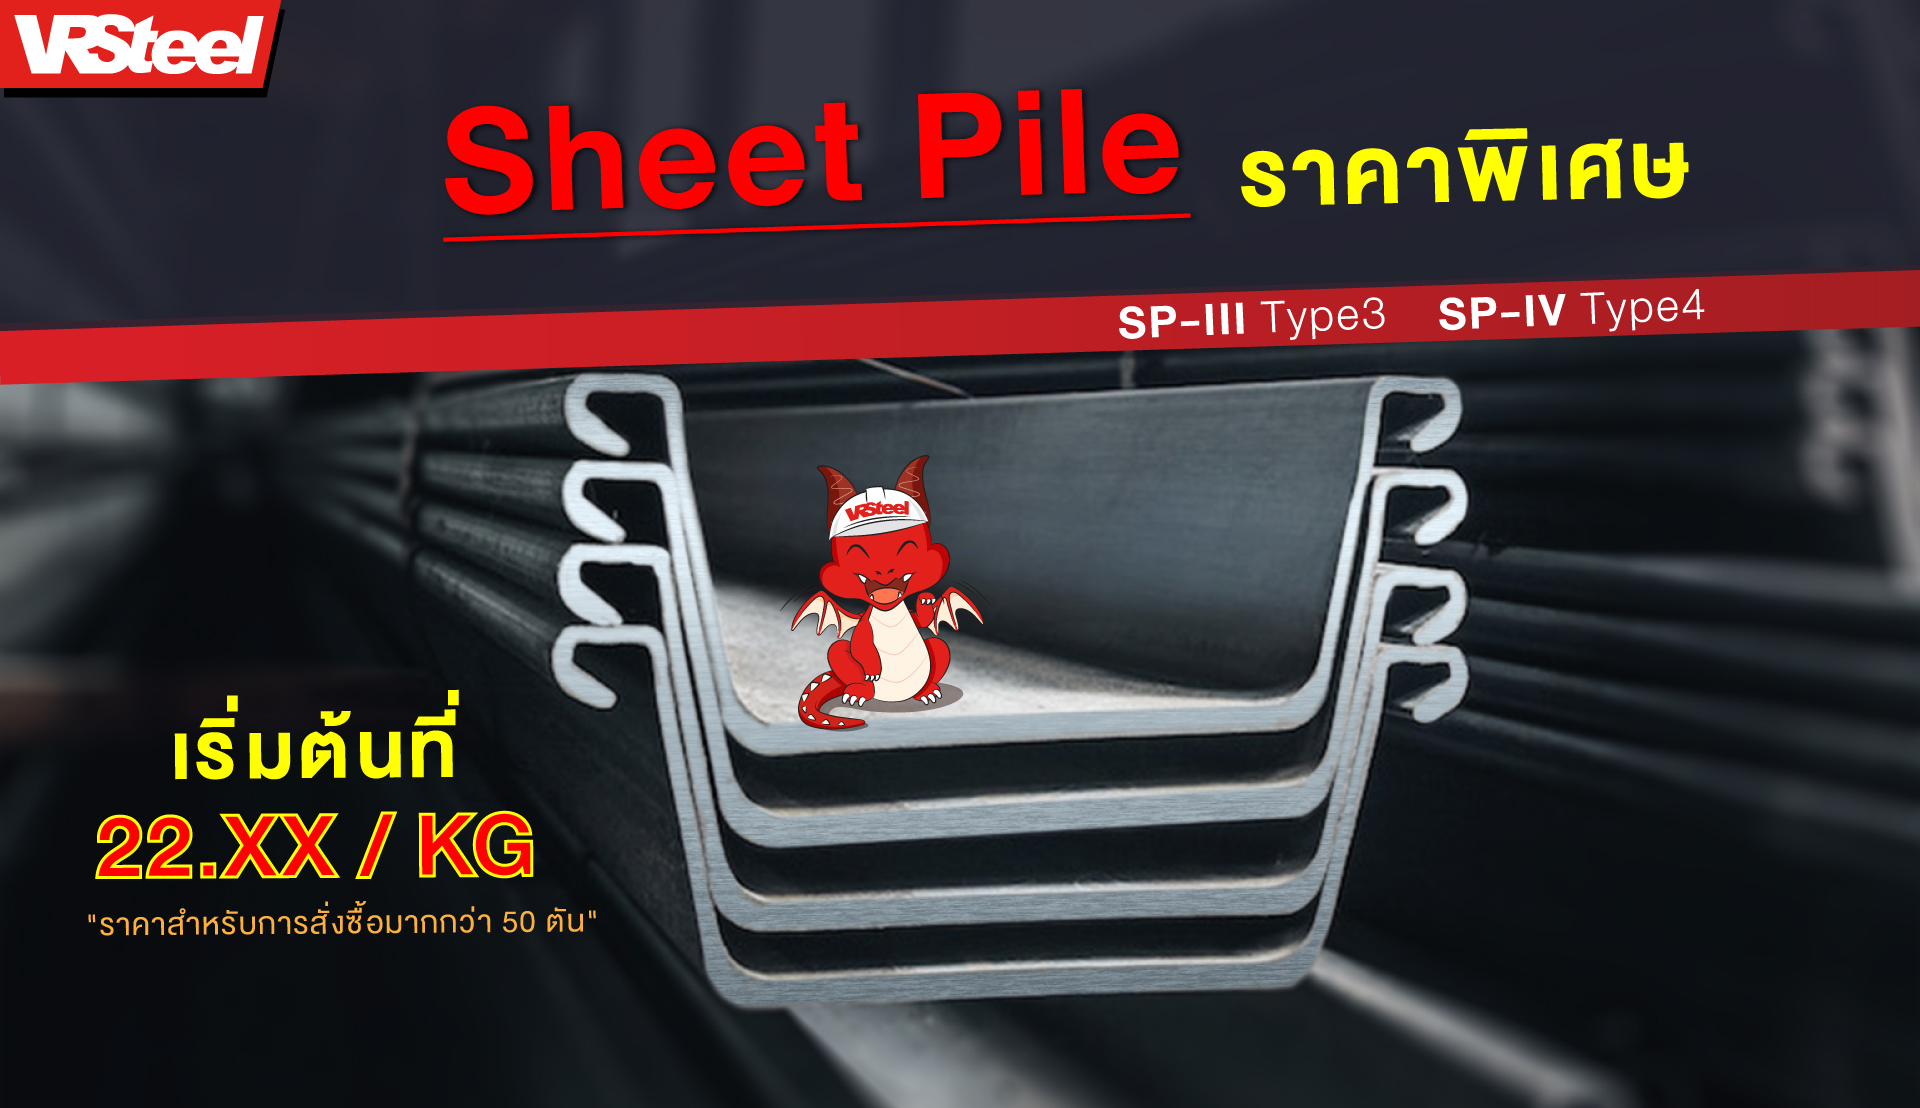 Promotion Sheet Pile ราคาพิเศษ